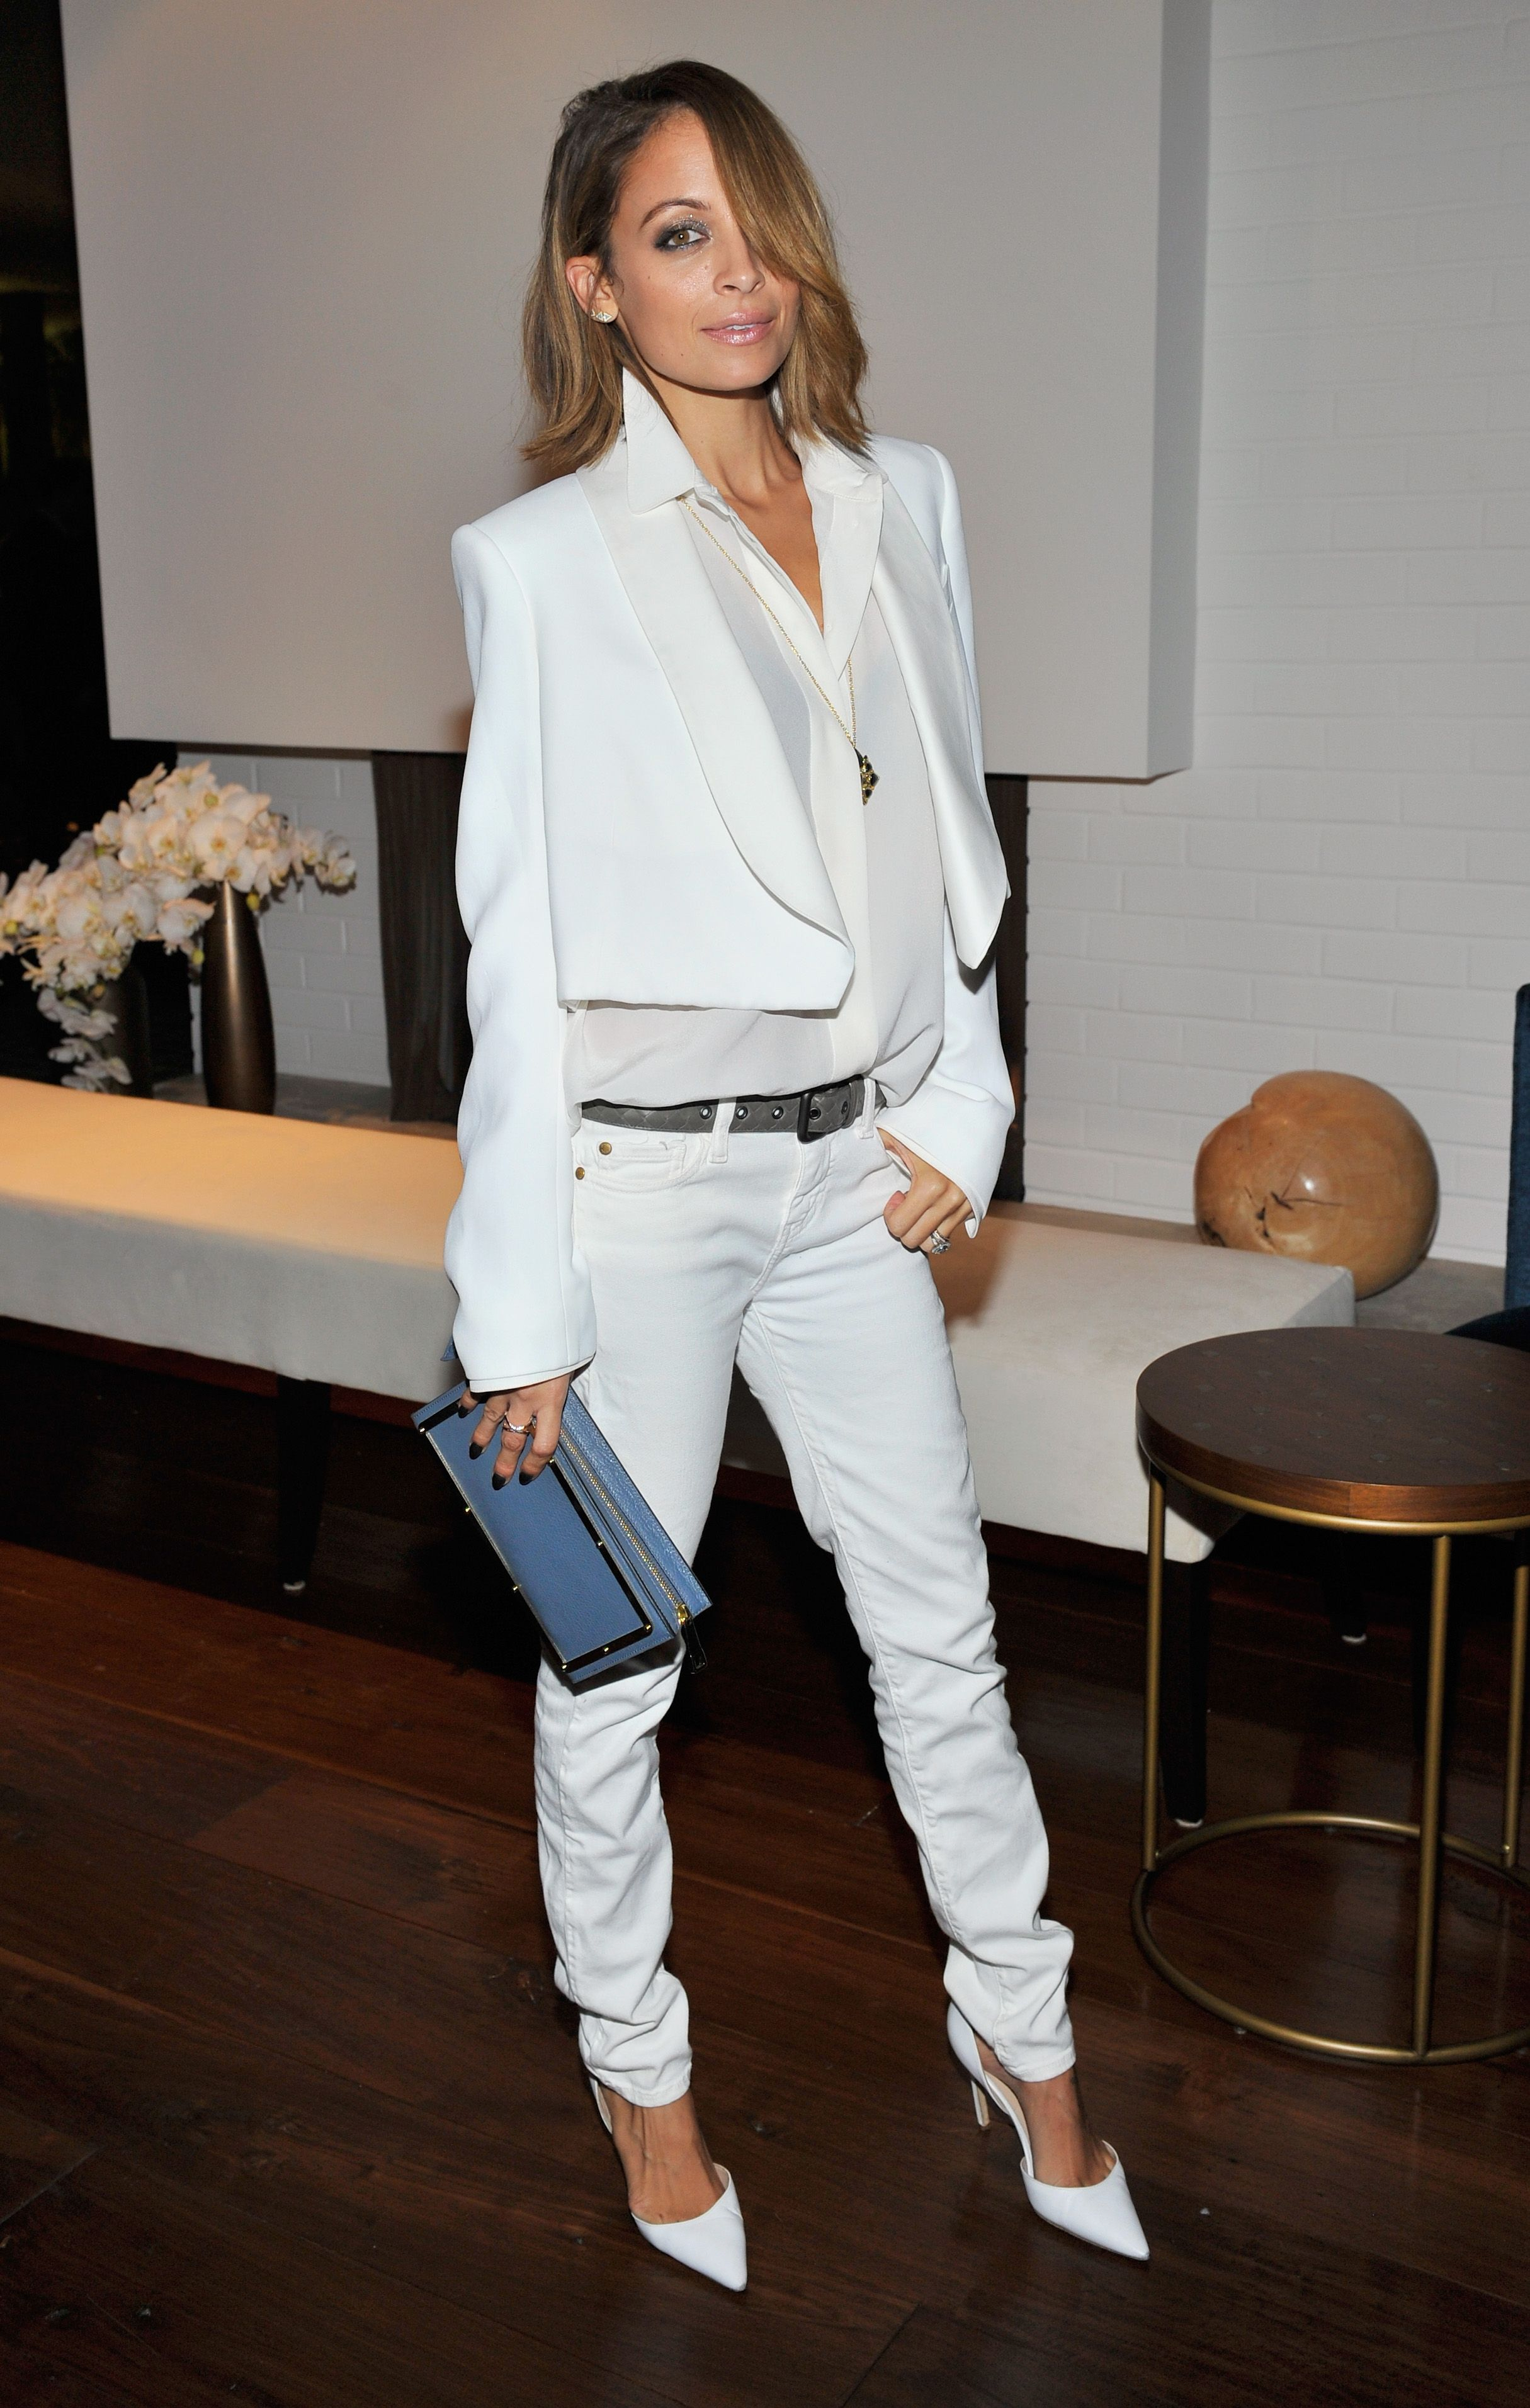 666b5e8607 Celebrity Street Style  The 10 Most Stylish Stars - Nicole Richie